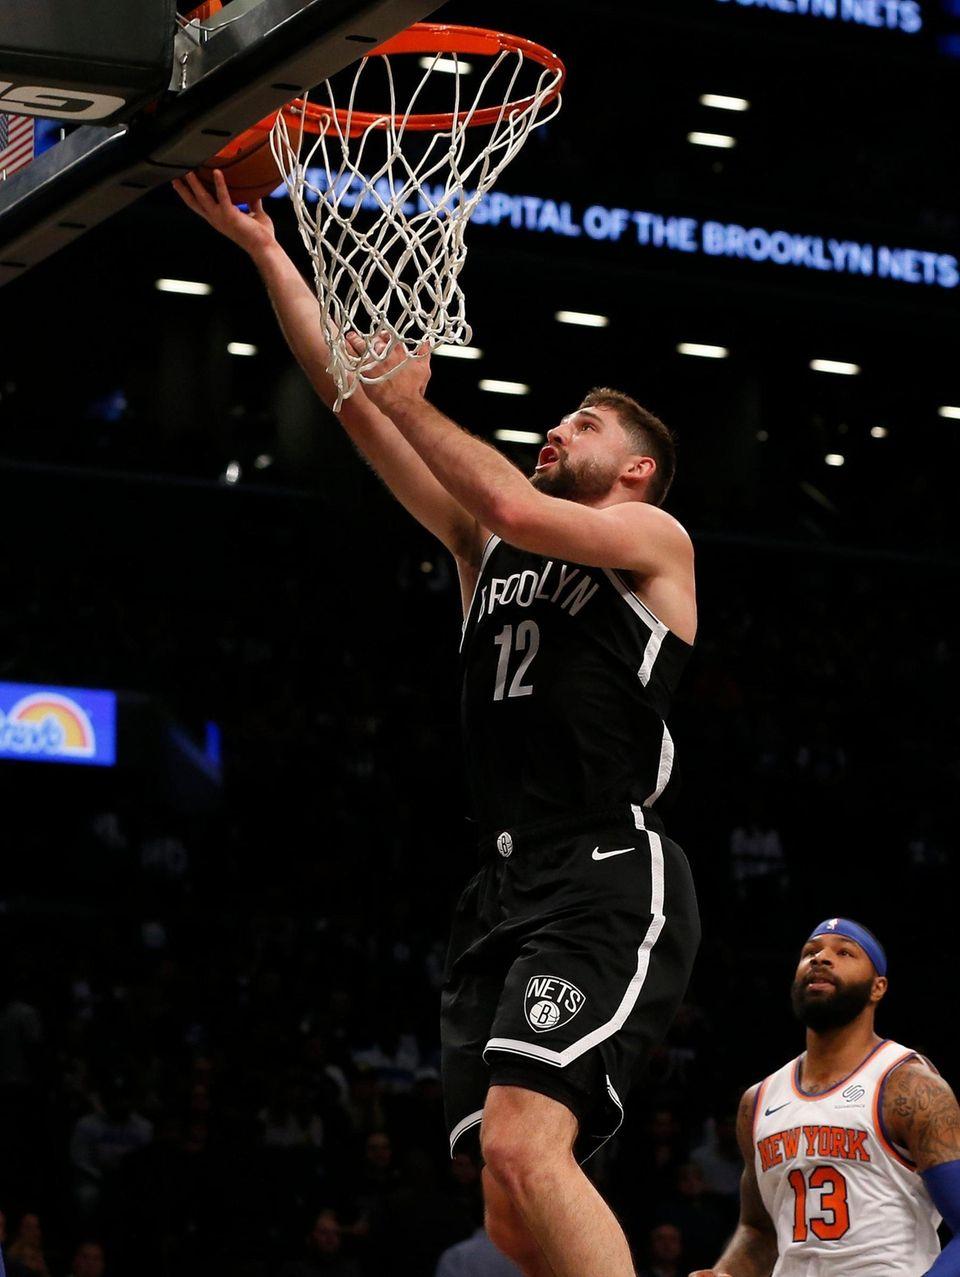 Joe Harris #12 of the Brooklyn Nets goes